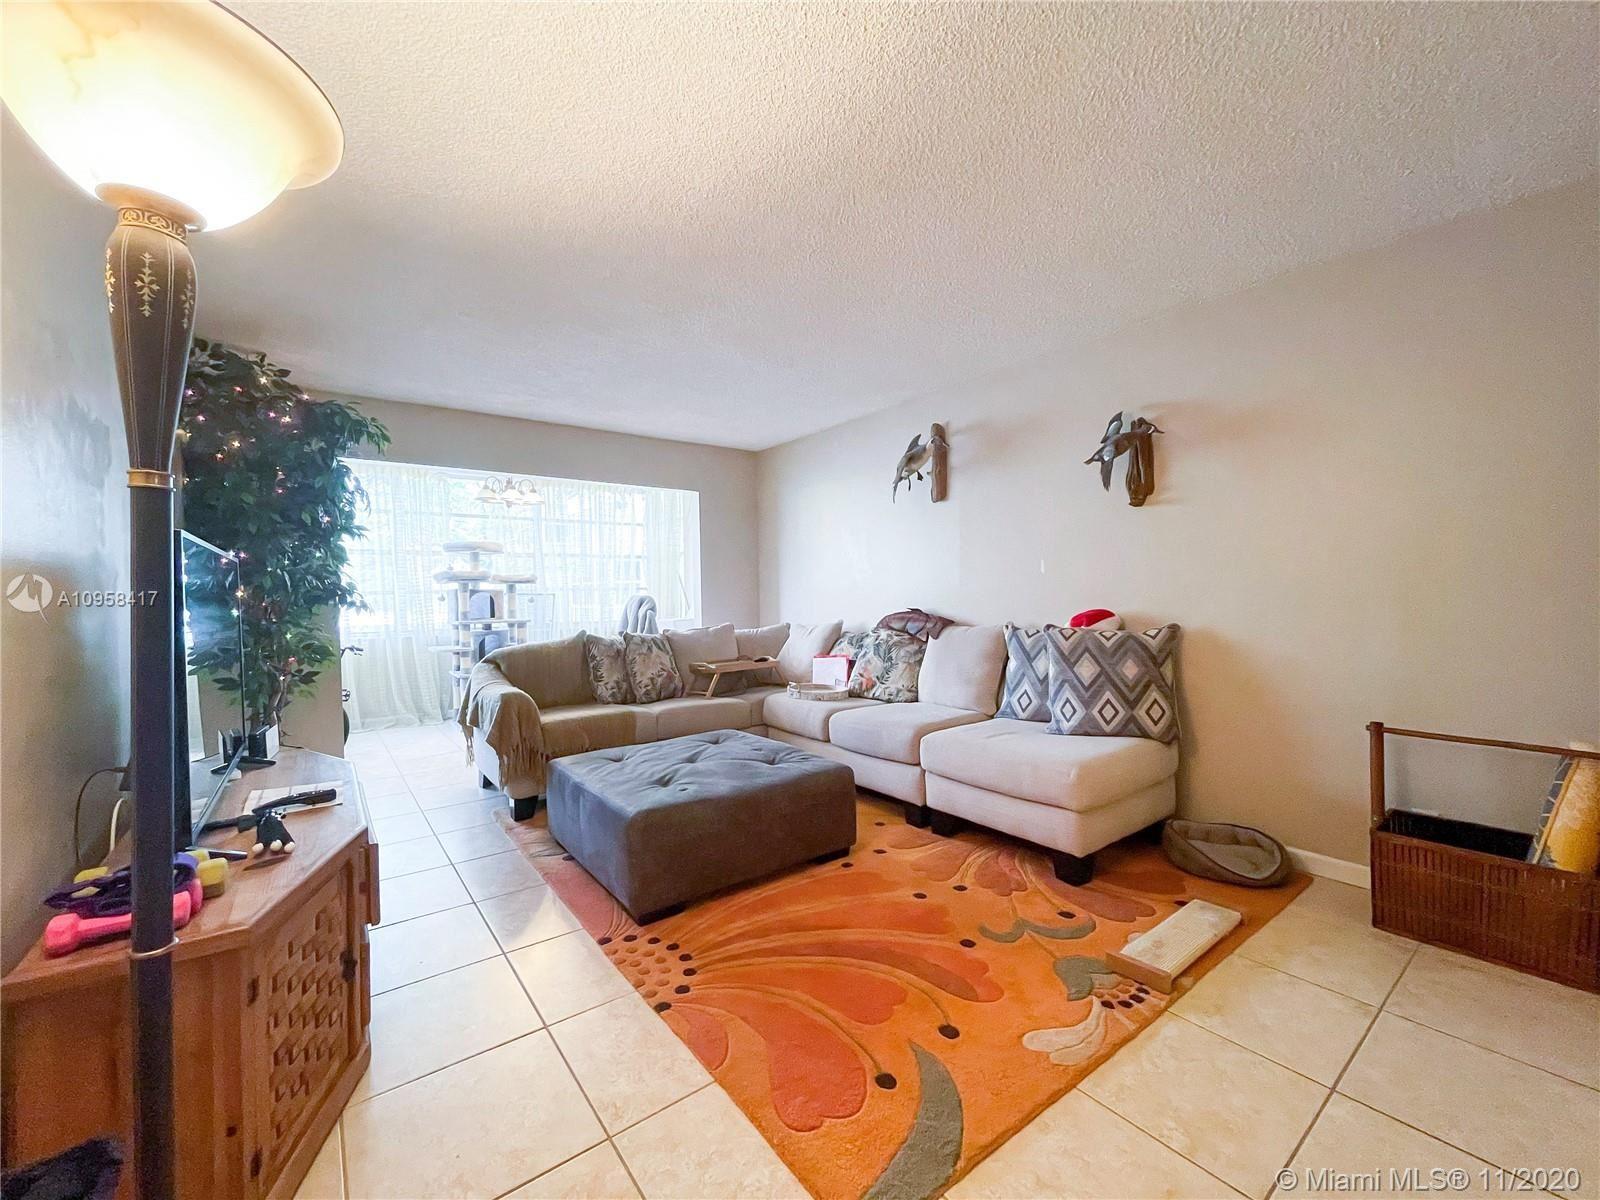 Photo of 6700 Cypress Rd #212, Plantation, FL 33317 (MLS # A10958417)